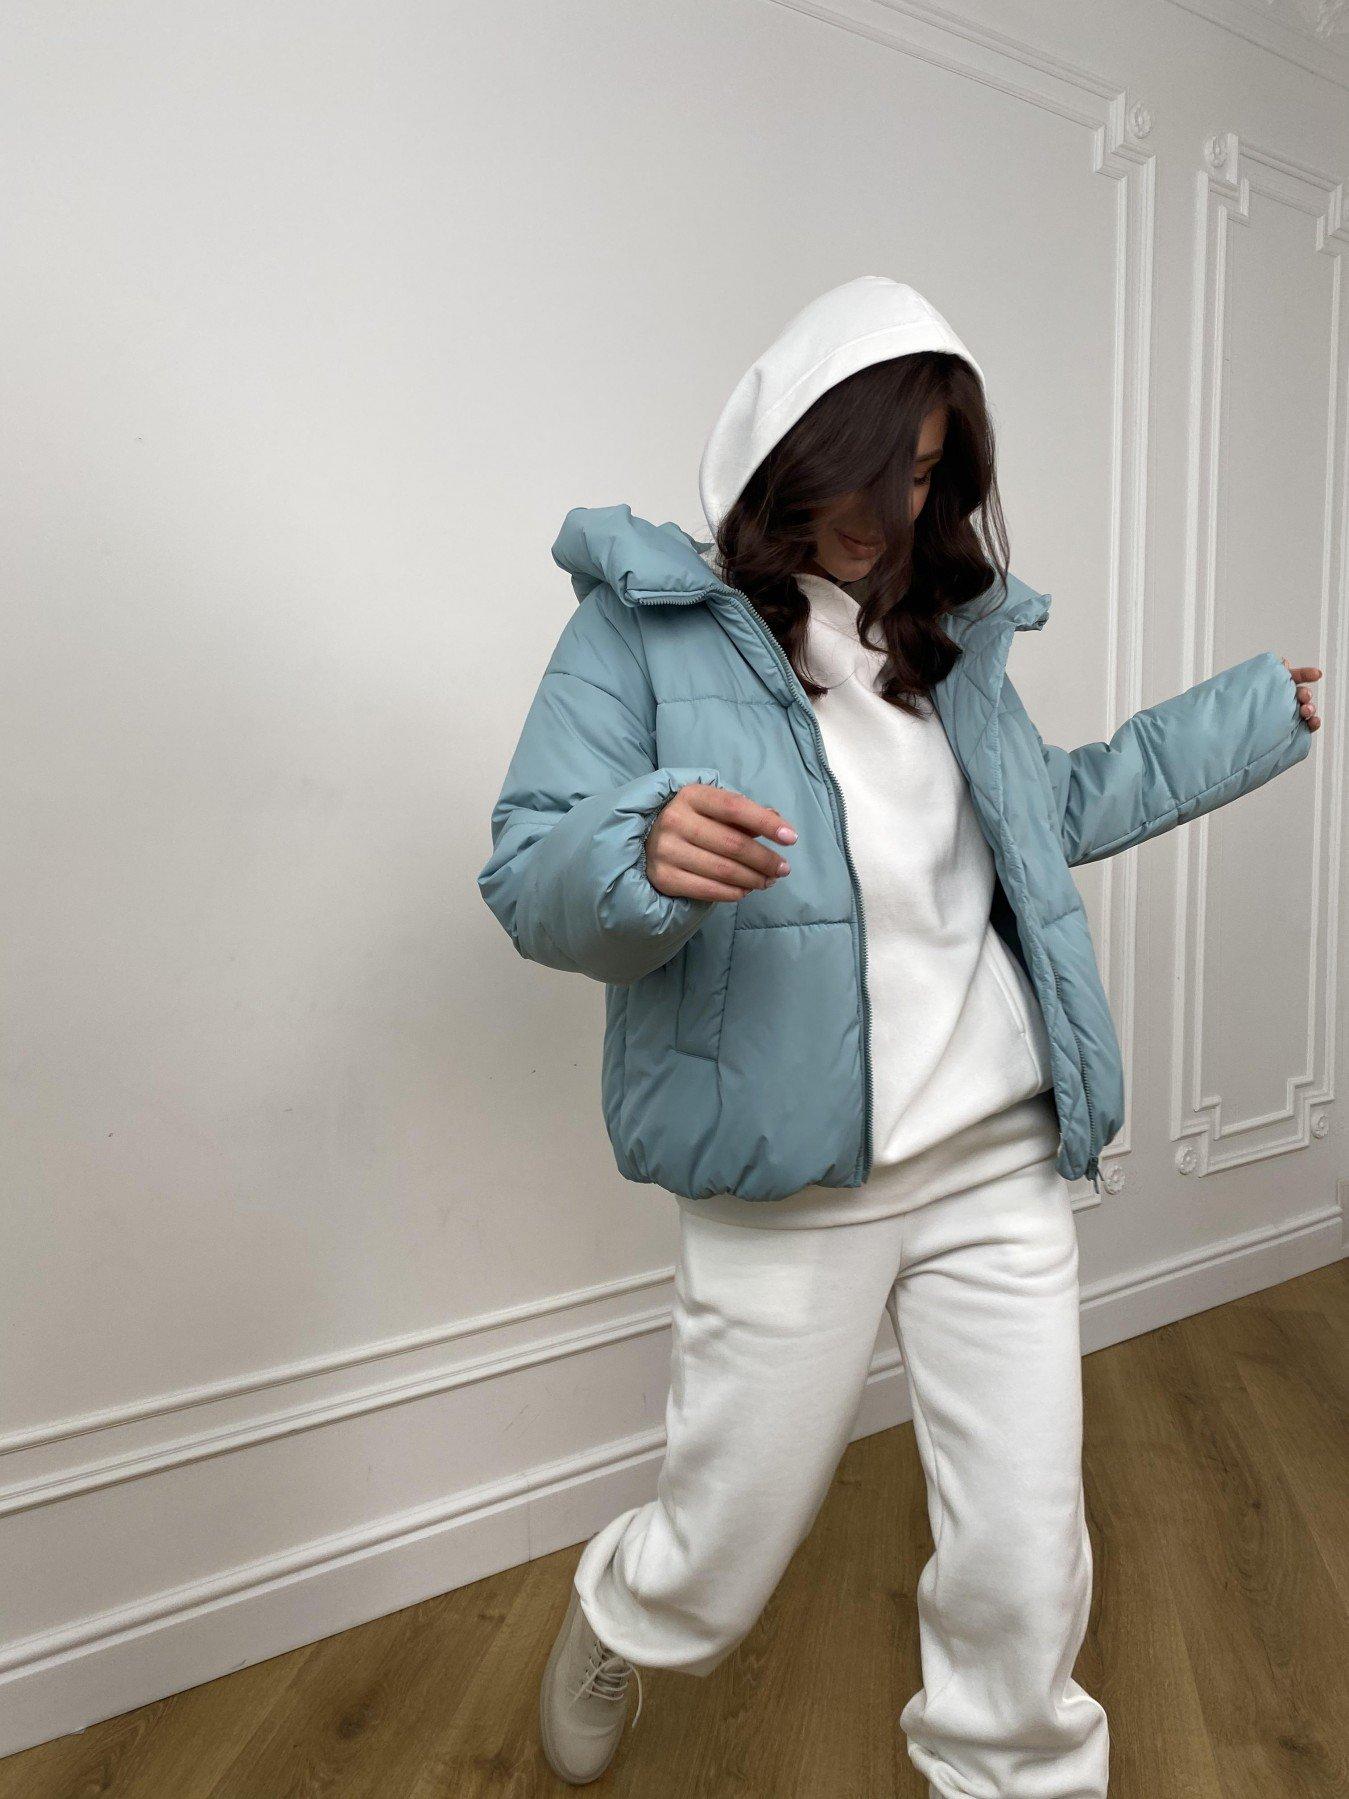 Нокс куртка  из плащевой ткани Astra 10994 АРТ. 47484 Цвет: Олива Astra - фото 7, интернет магазин tm-modus.ru